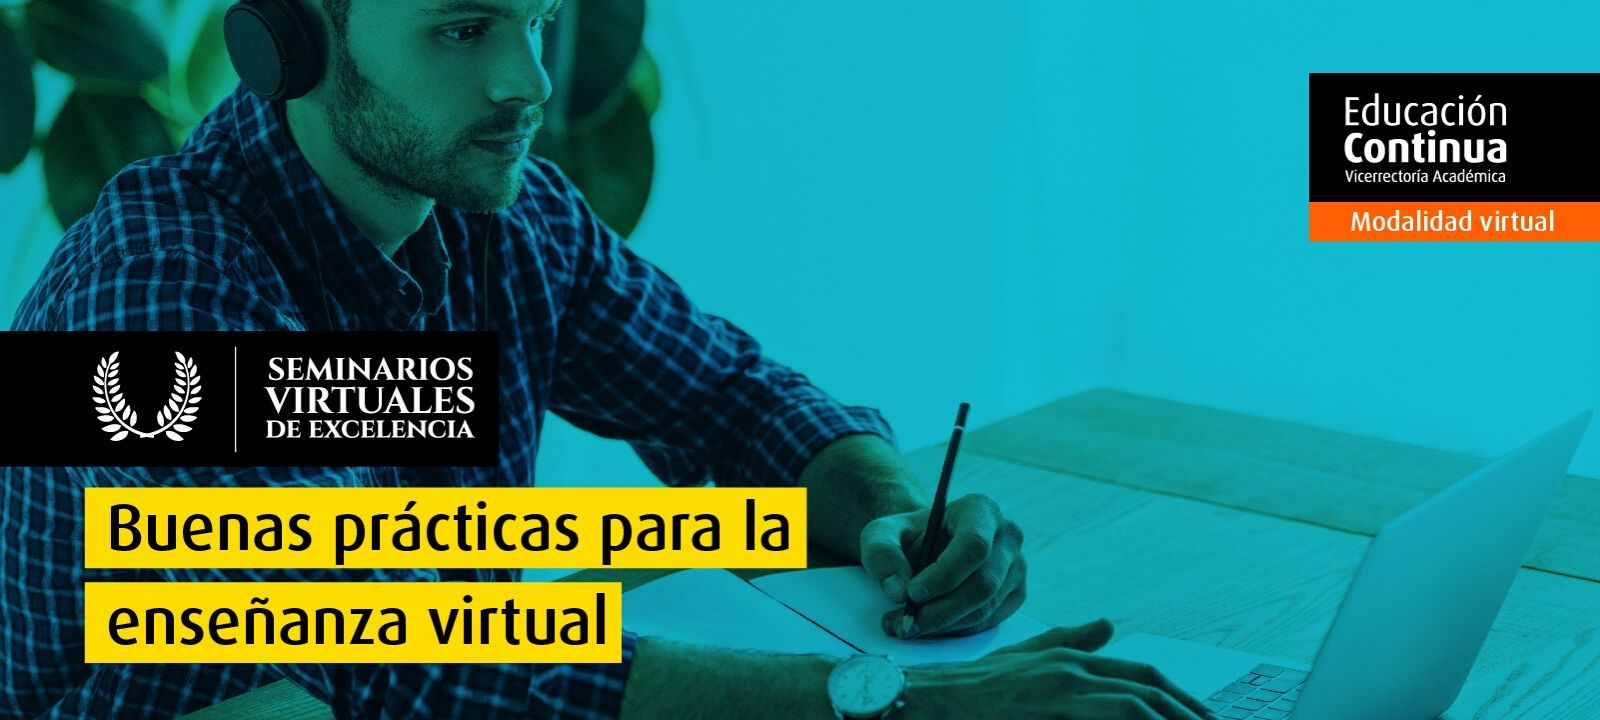 Seminario Virtual de Excelencia - Buenas prácticas para la enseñanza virtual